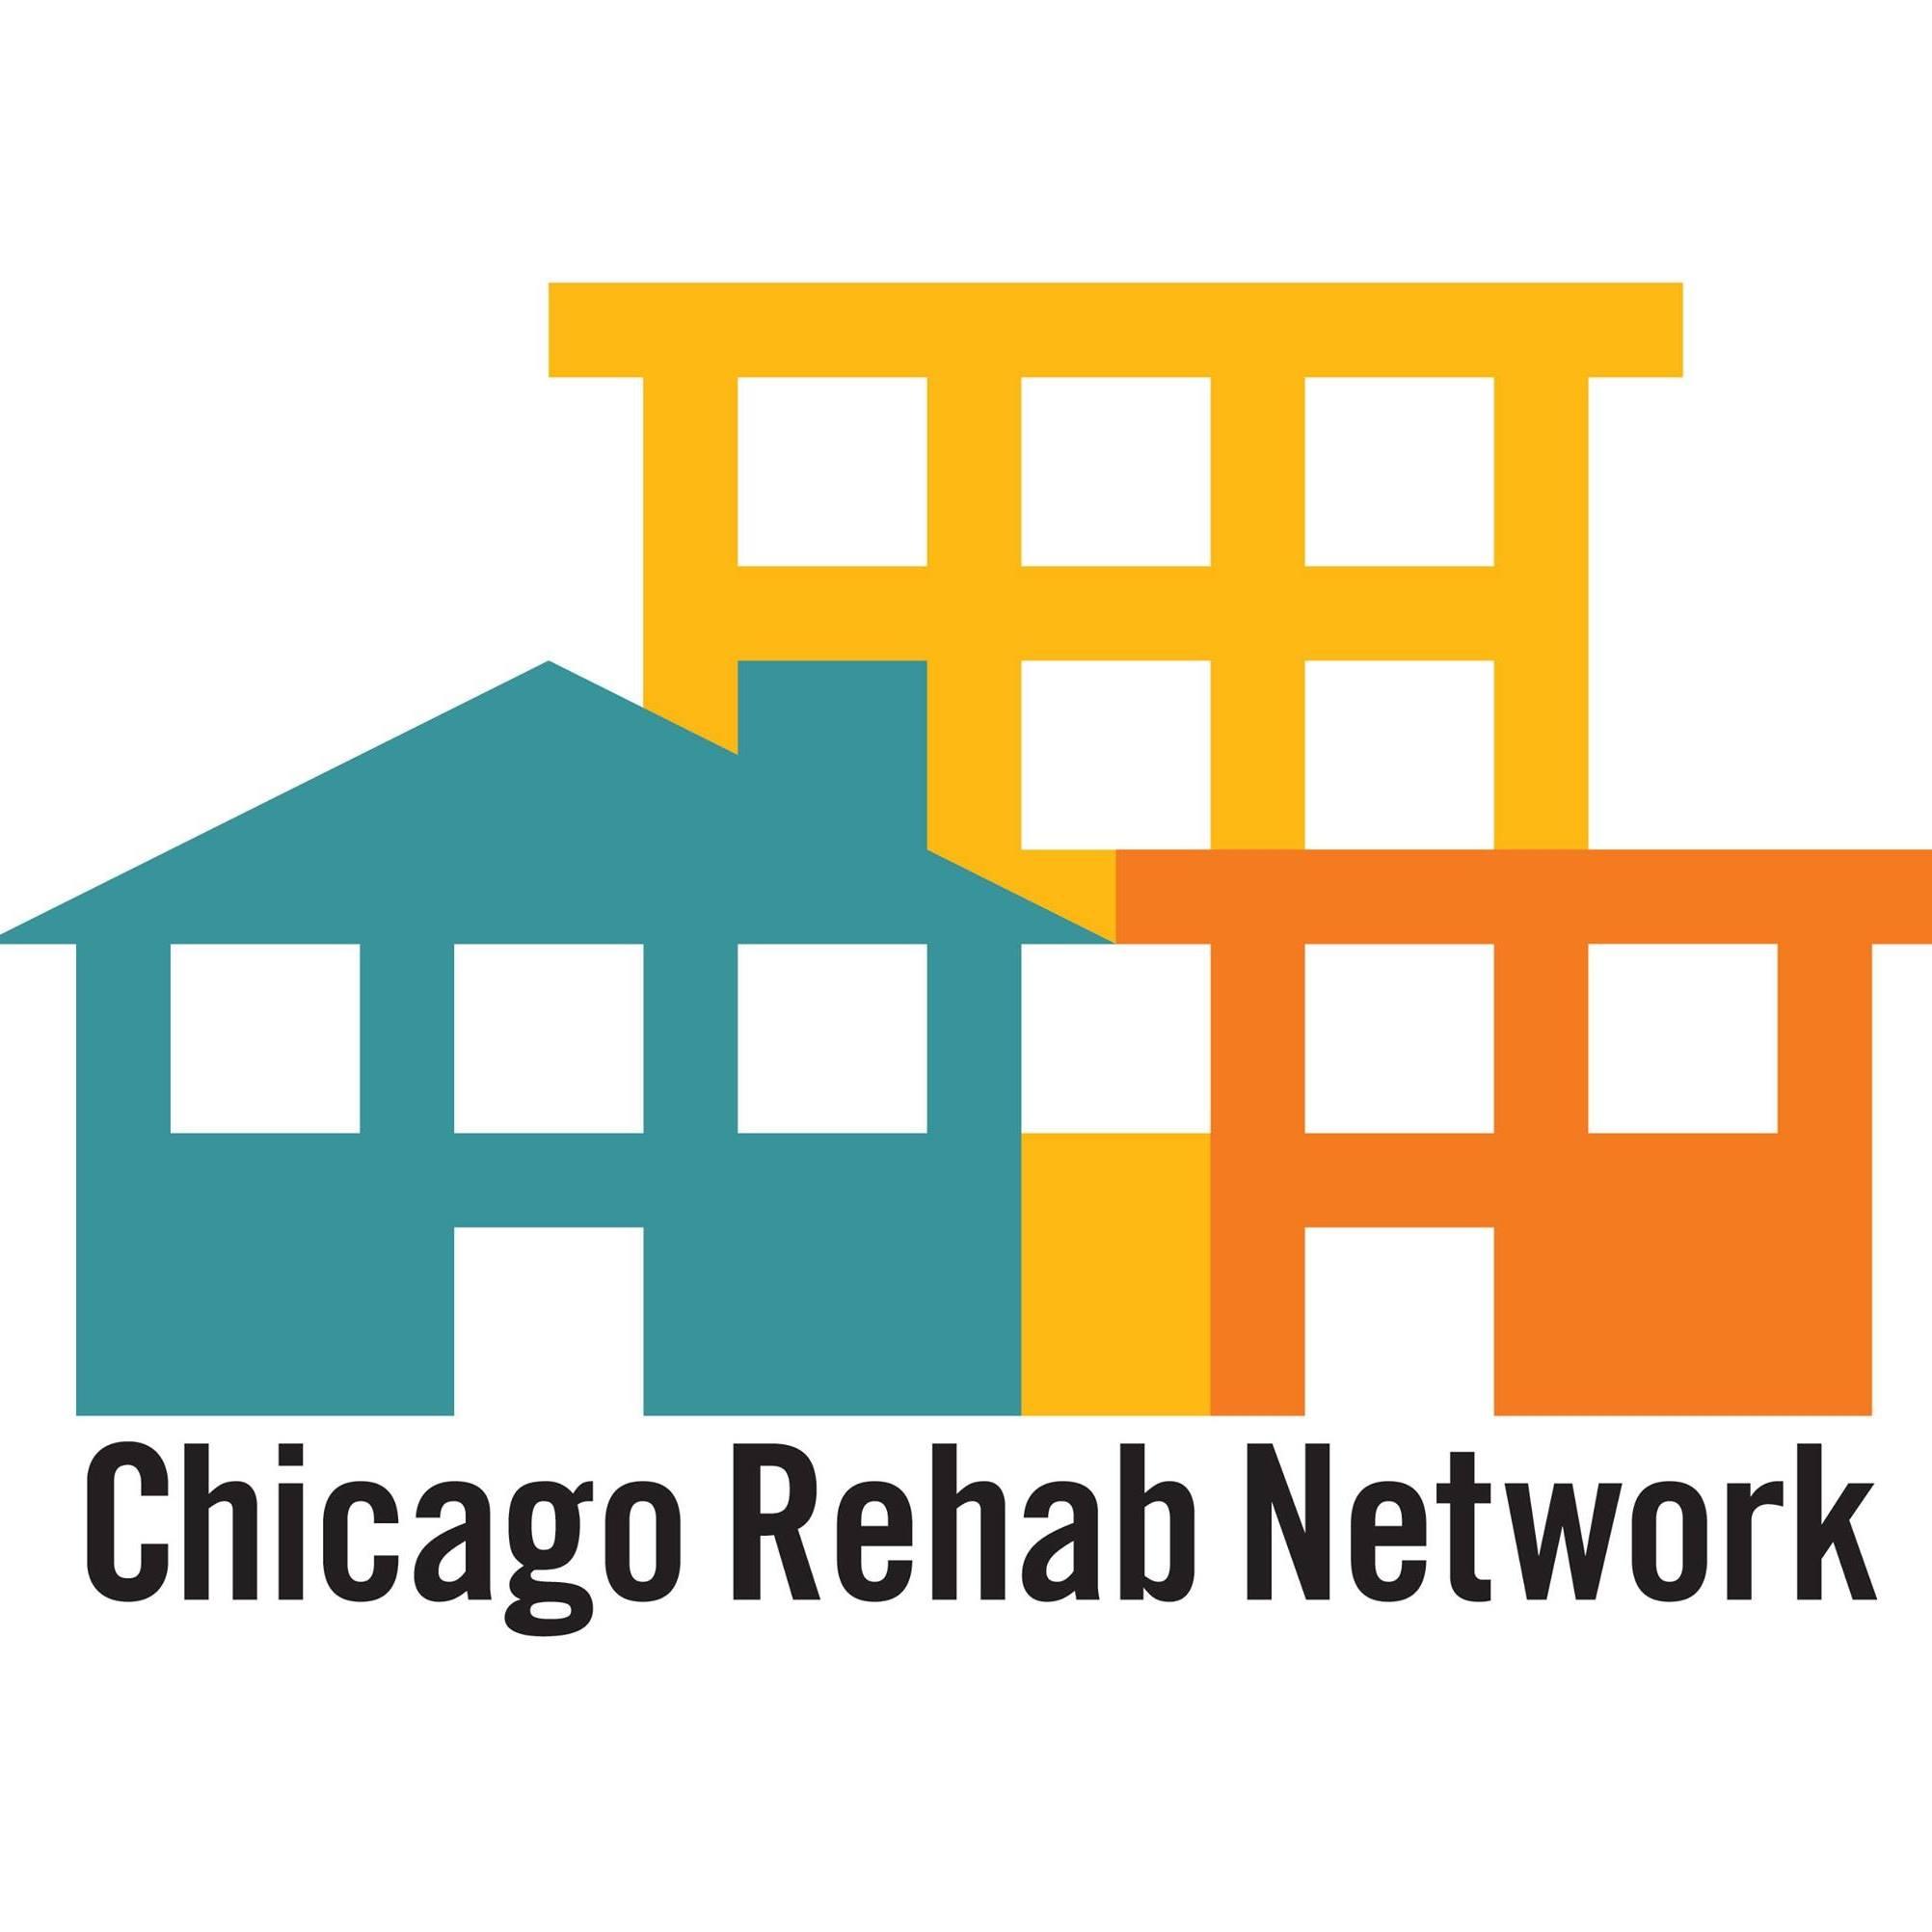 Chicago Rehab Network logo- 3 small houses